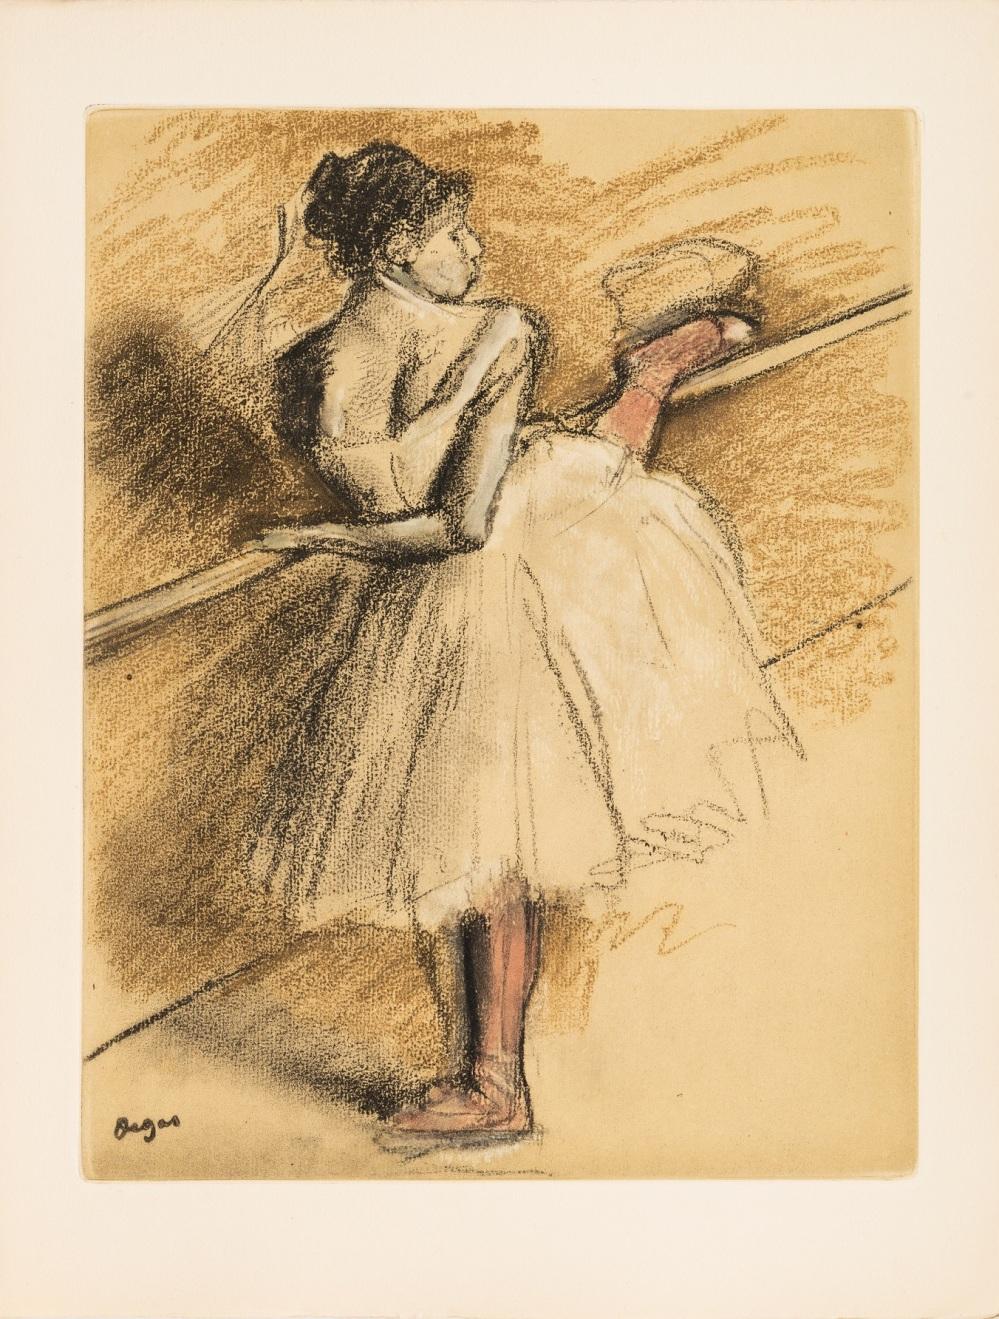 MSC_Degas Experience 27-08-2019 1